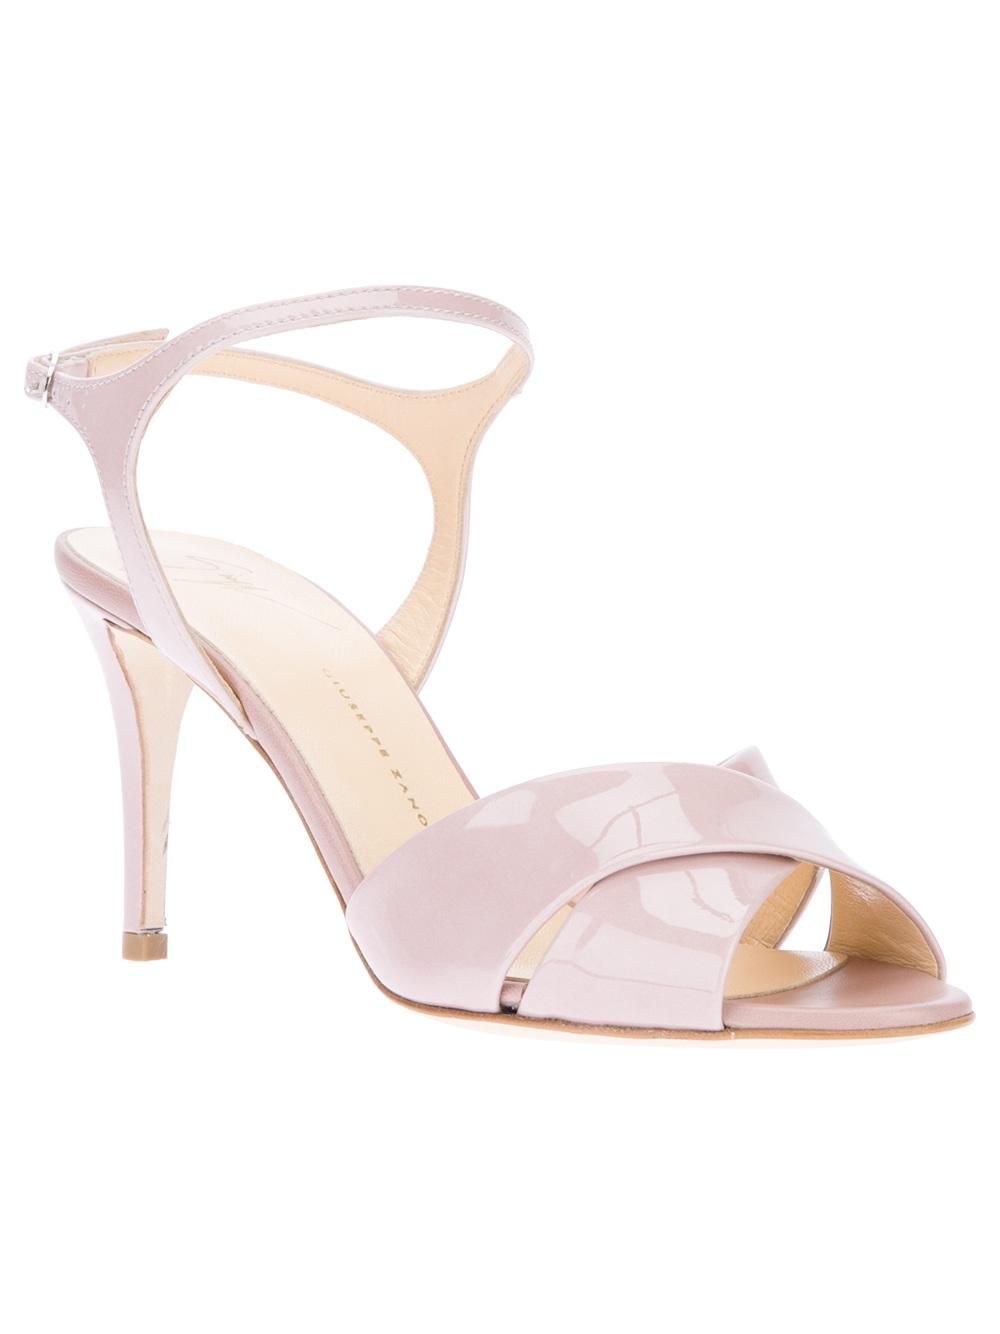 giuseppe zanotti patent sandal in pink lyst